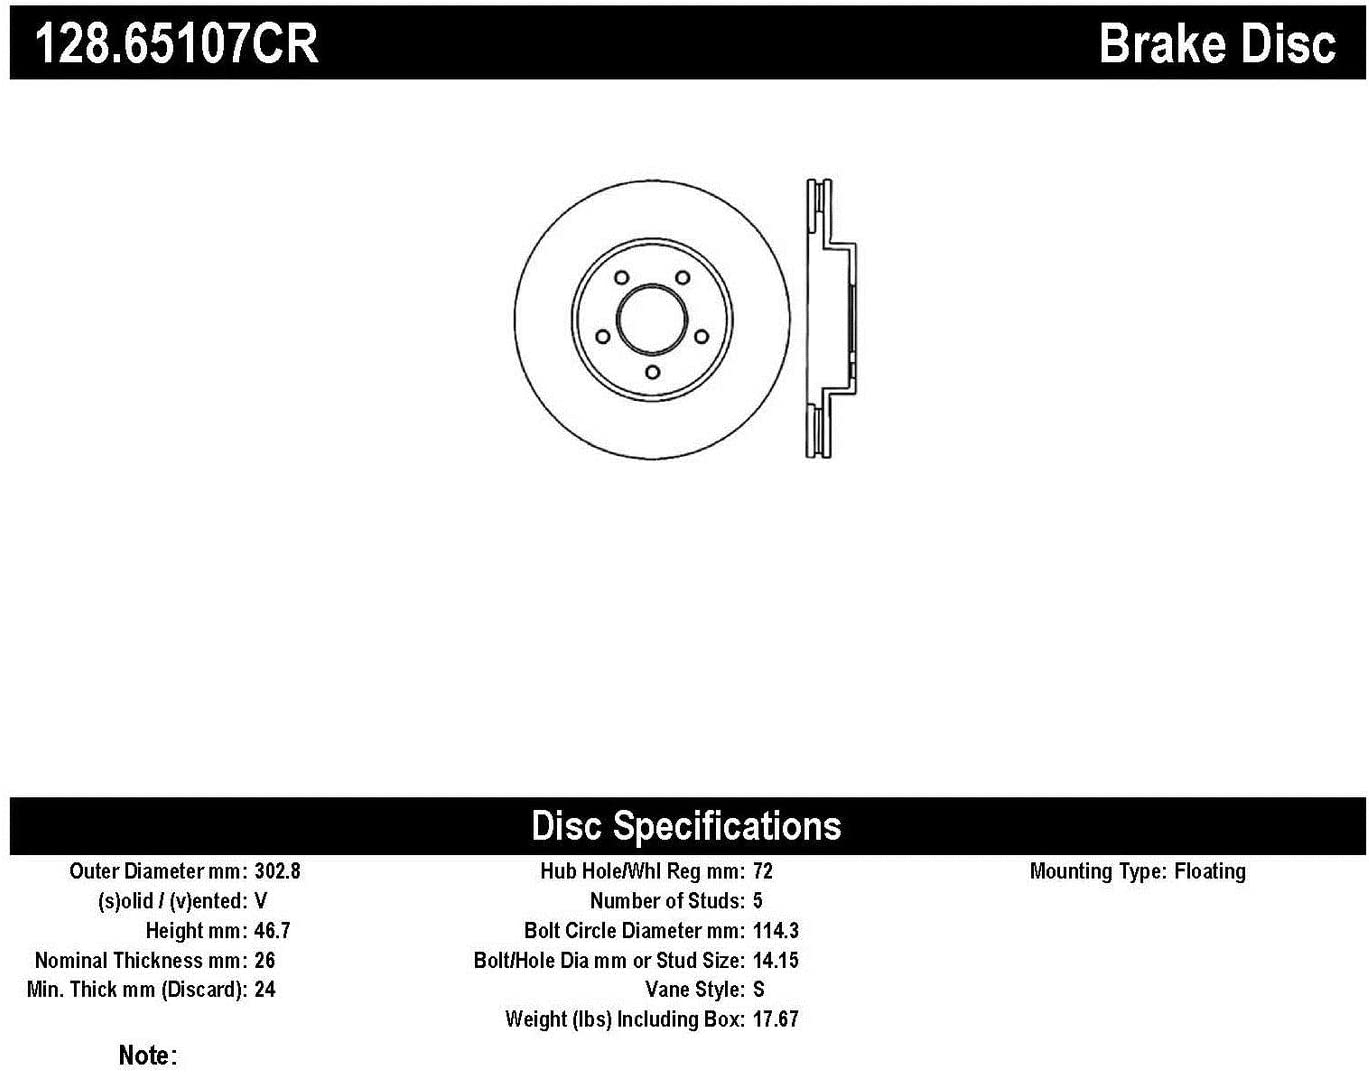 StopTech Brake Rotor 128.65107CR